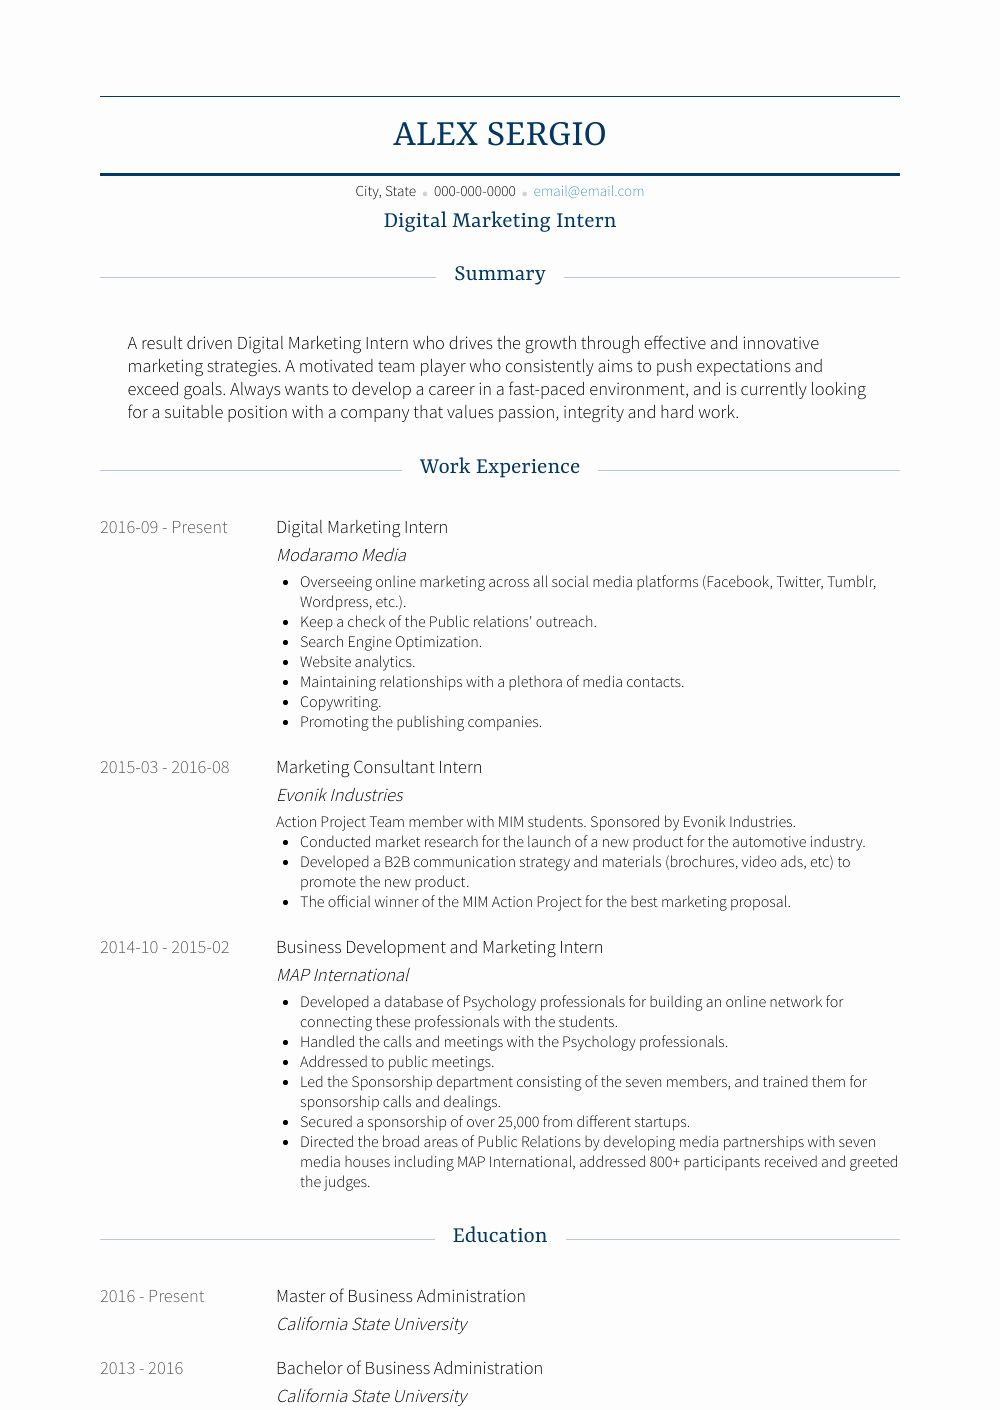 Digital Marketing Resume Sample Lovely Digital Marketing Intern Resume Samples Templates Marketing Resume Digital Marketing Digital Marketing Quotes